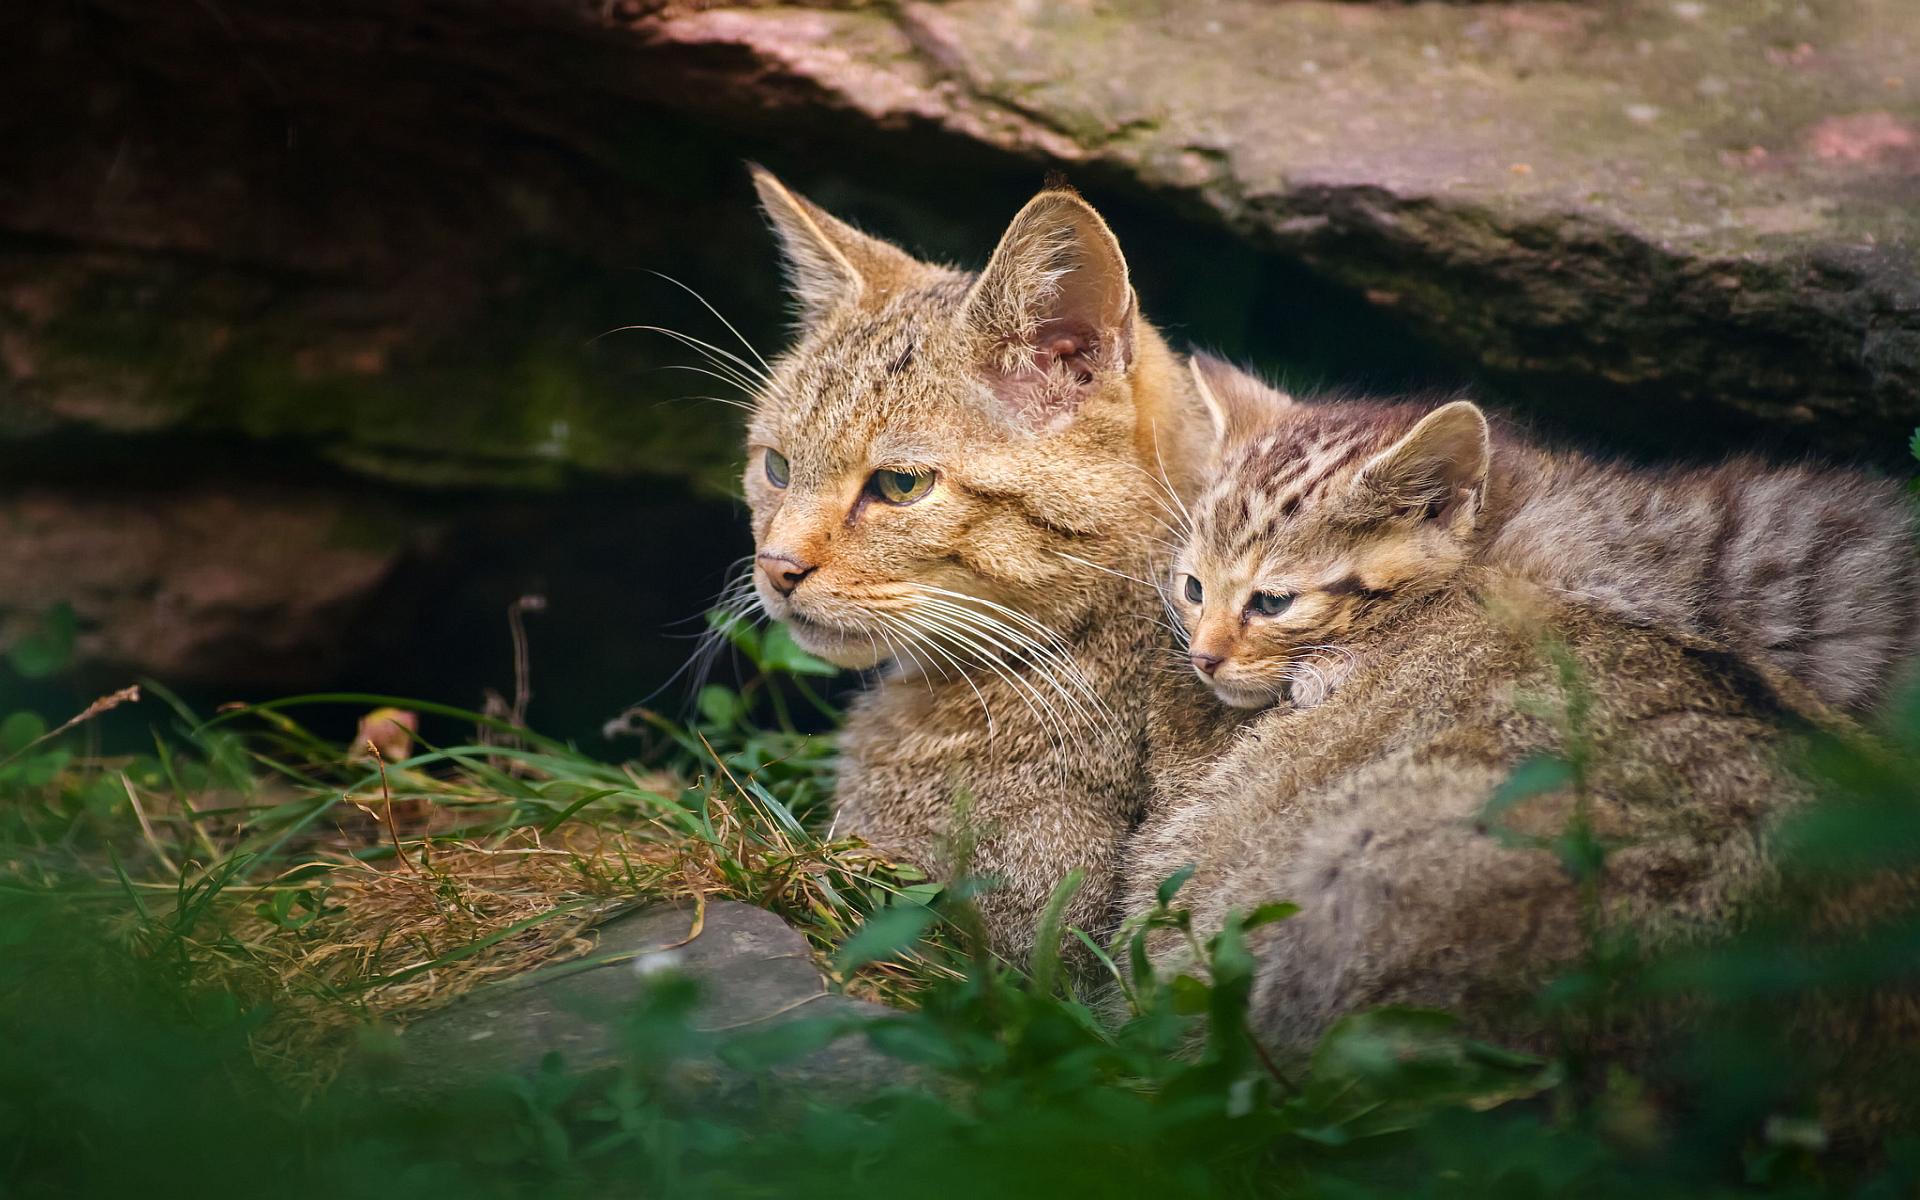 Wild Cats Hd Desktop Wallpapers 4k Hd